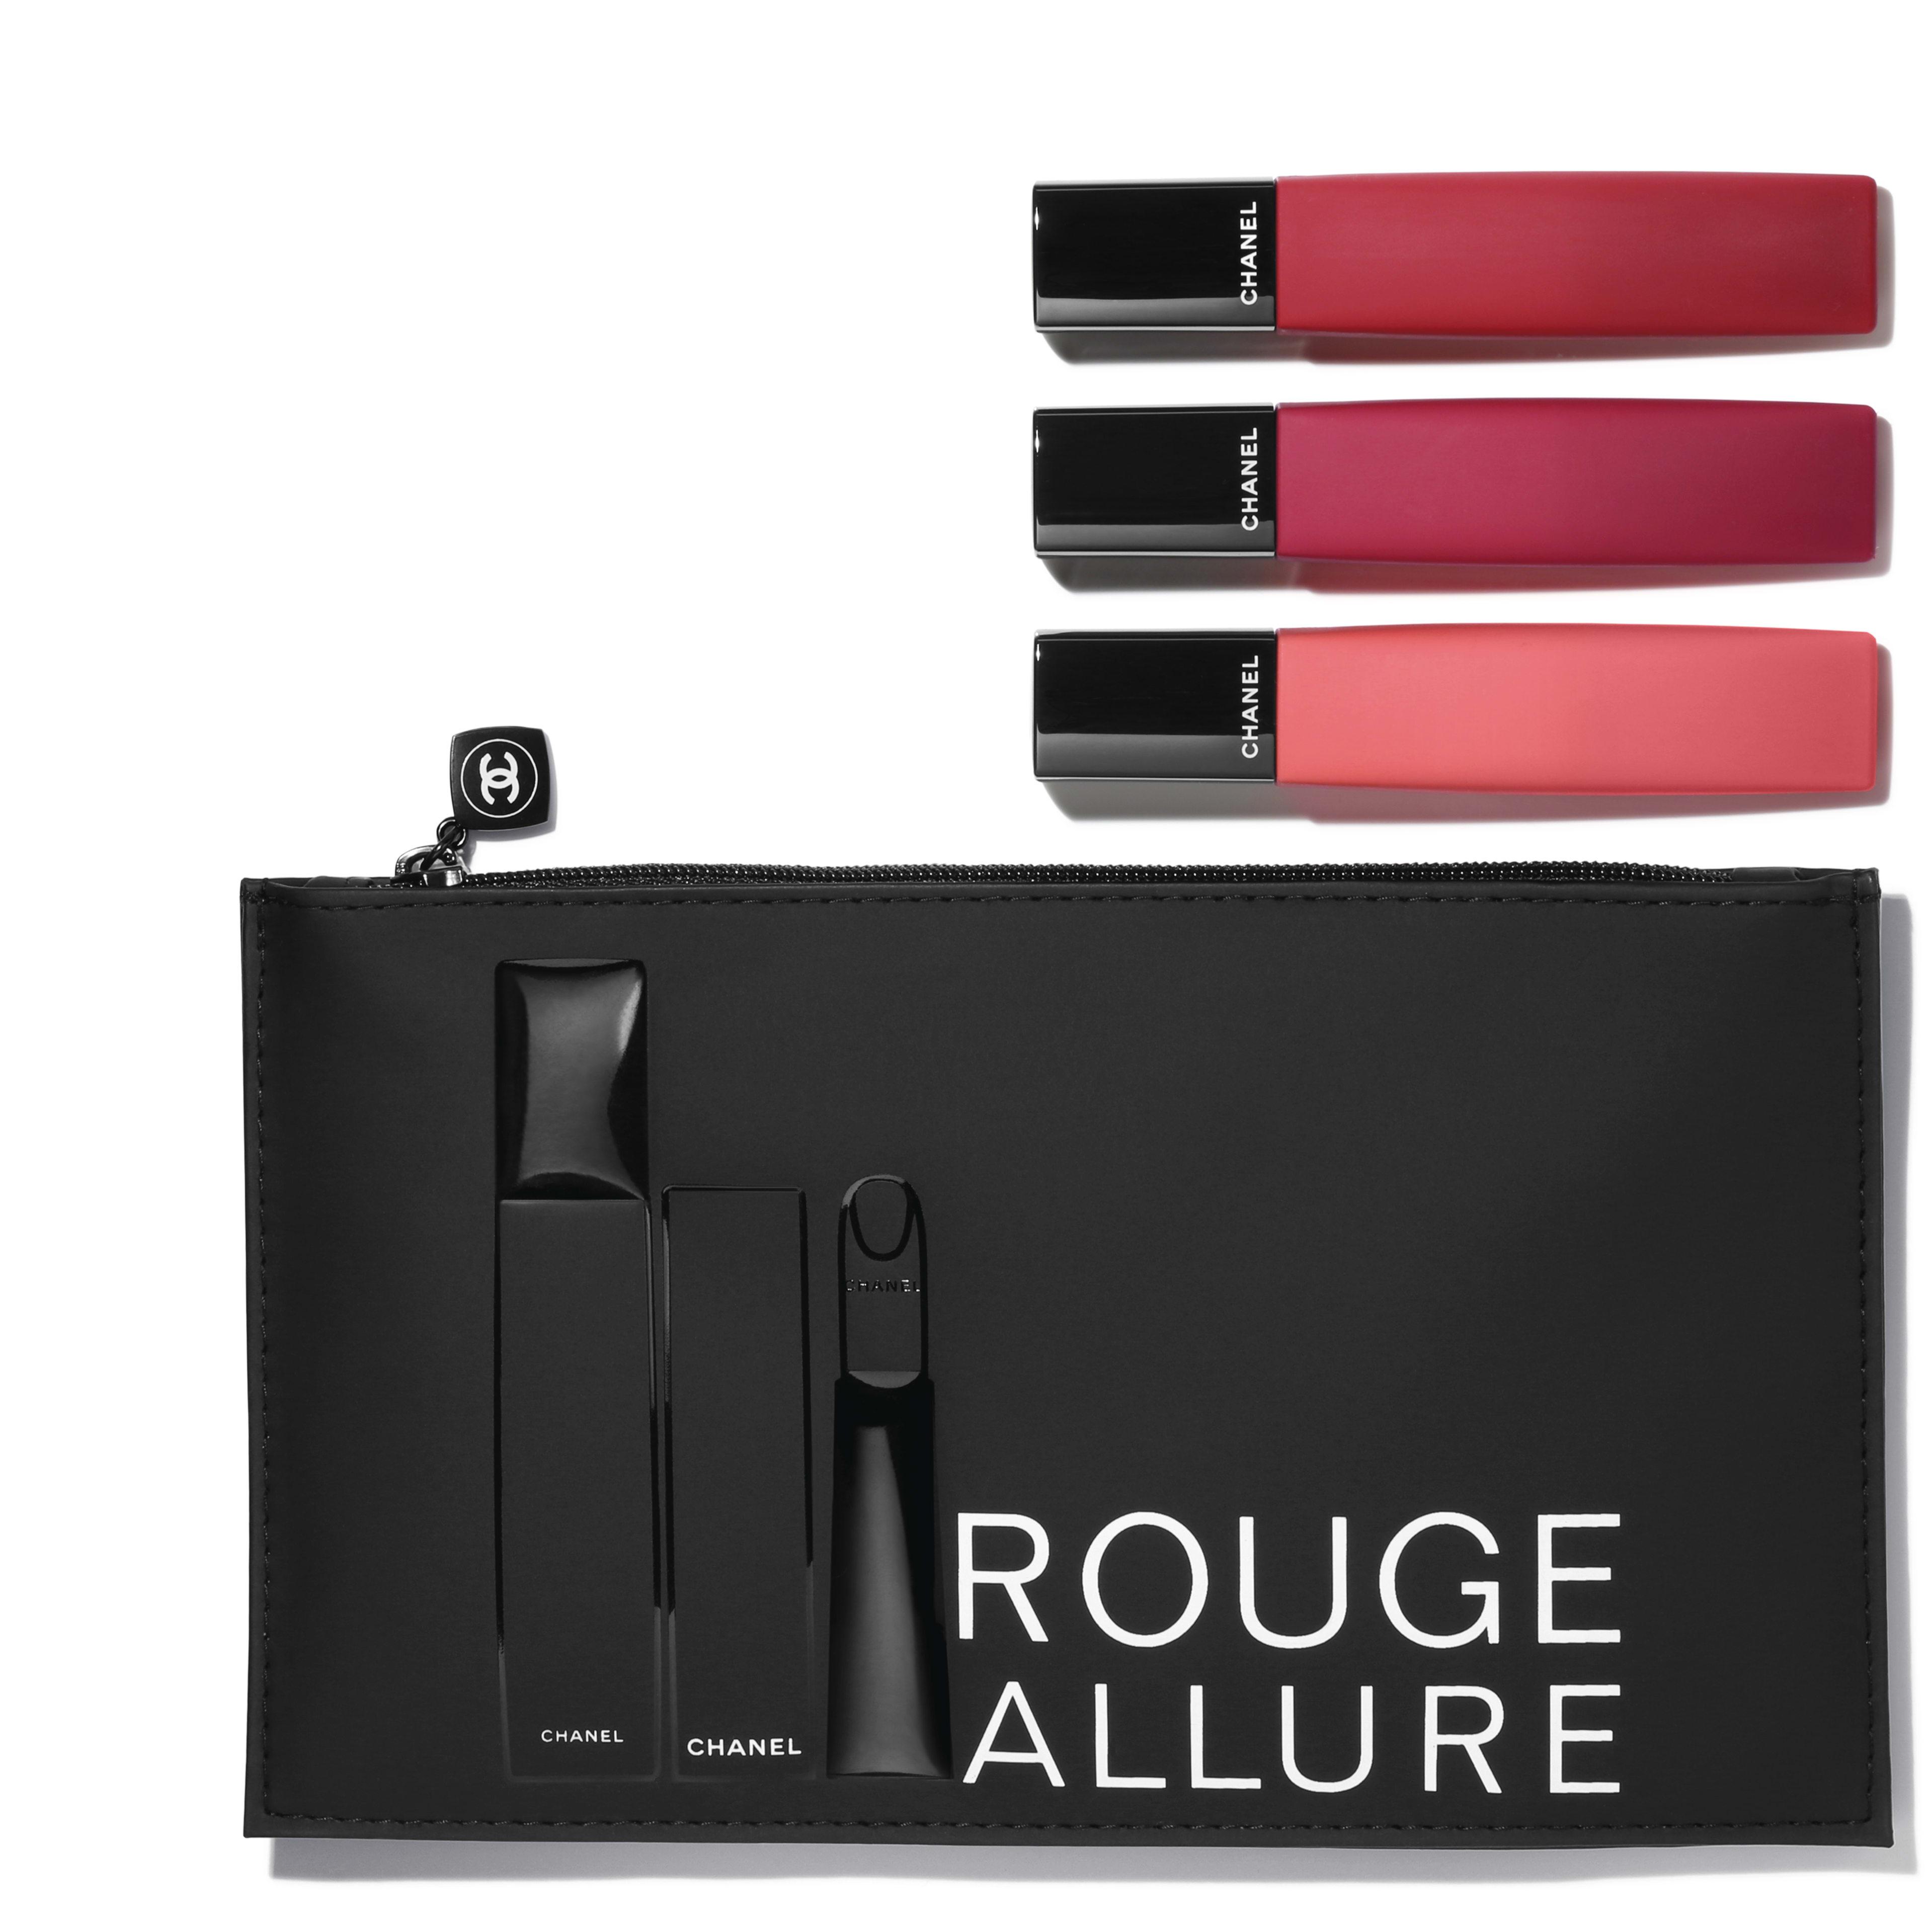 ROUGE ALLURE LIQUID POWDER - makeup - 0.9FL. OZ. - Default view